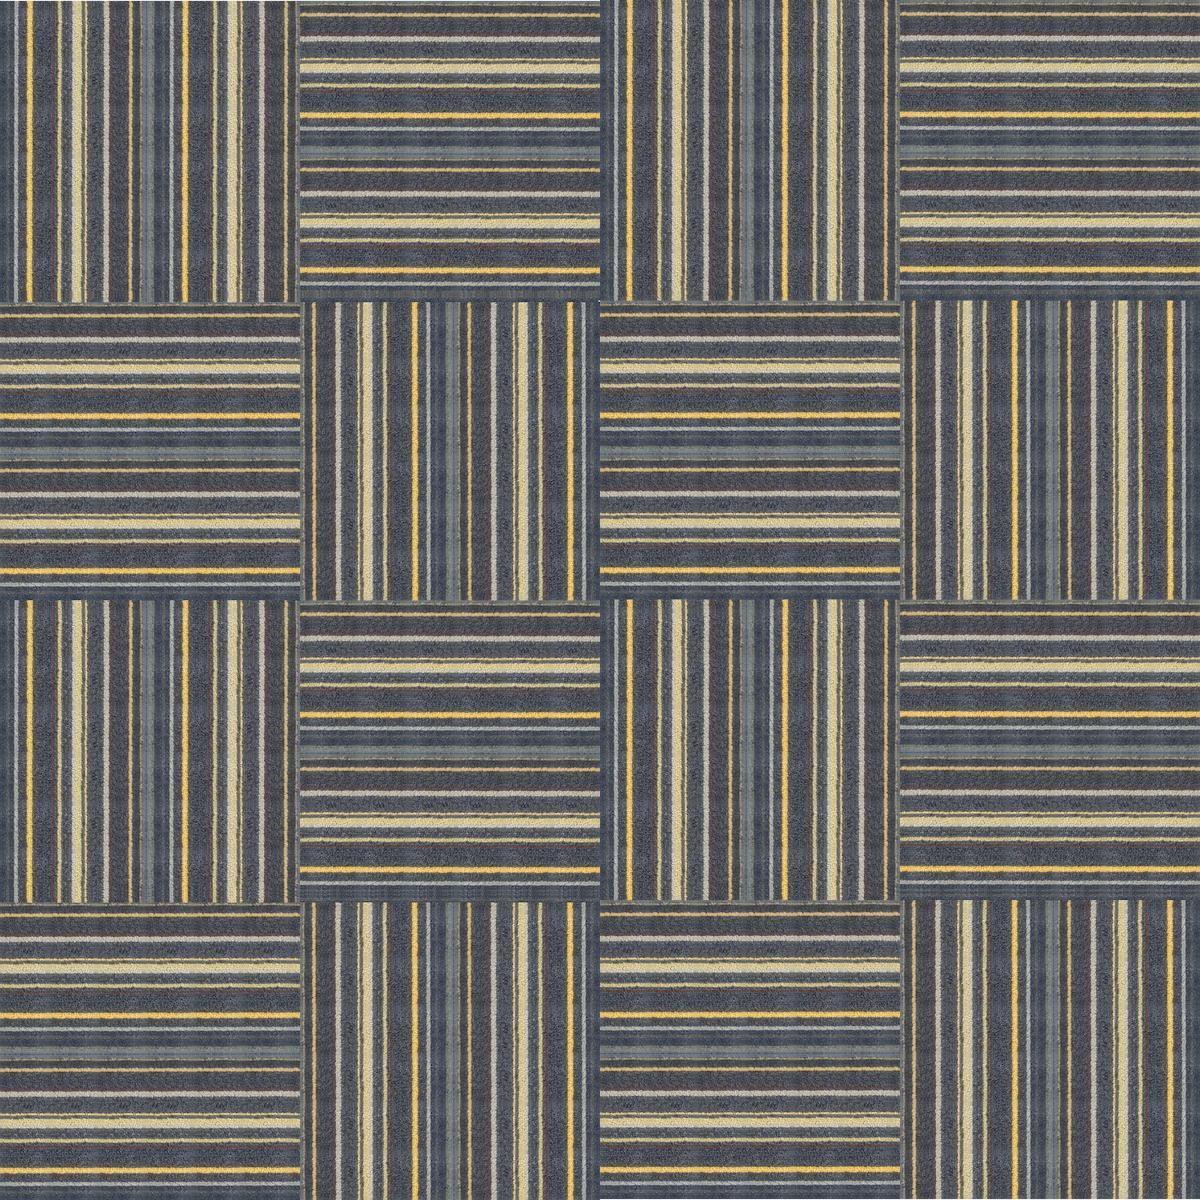 seamless carpet texture. Seamless Carpet Textures 01 Seamless Carpet Texture